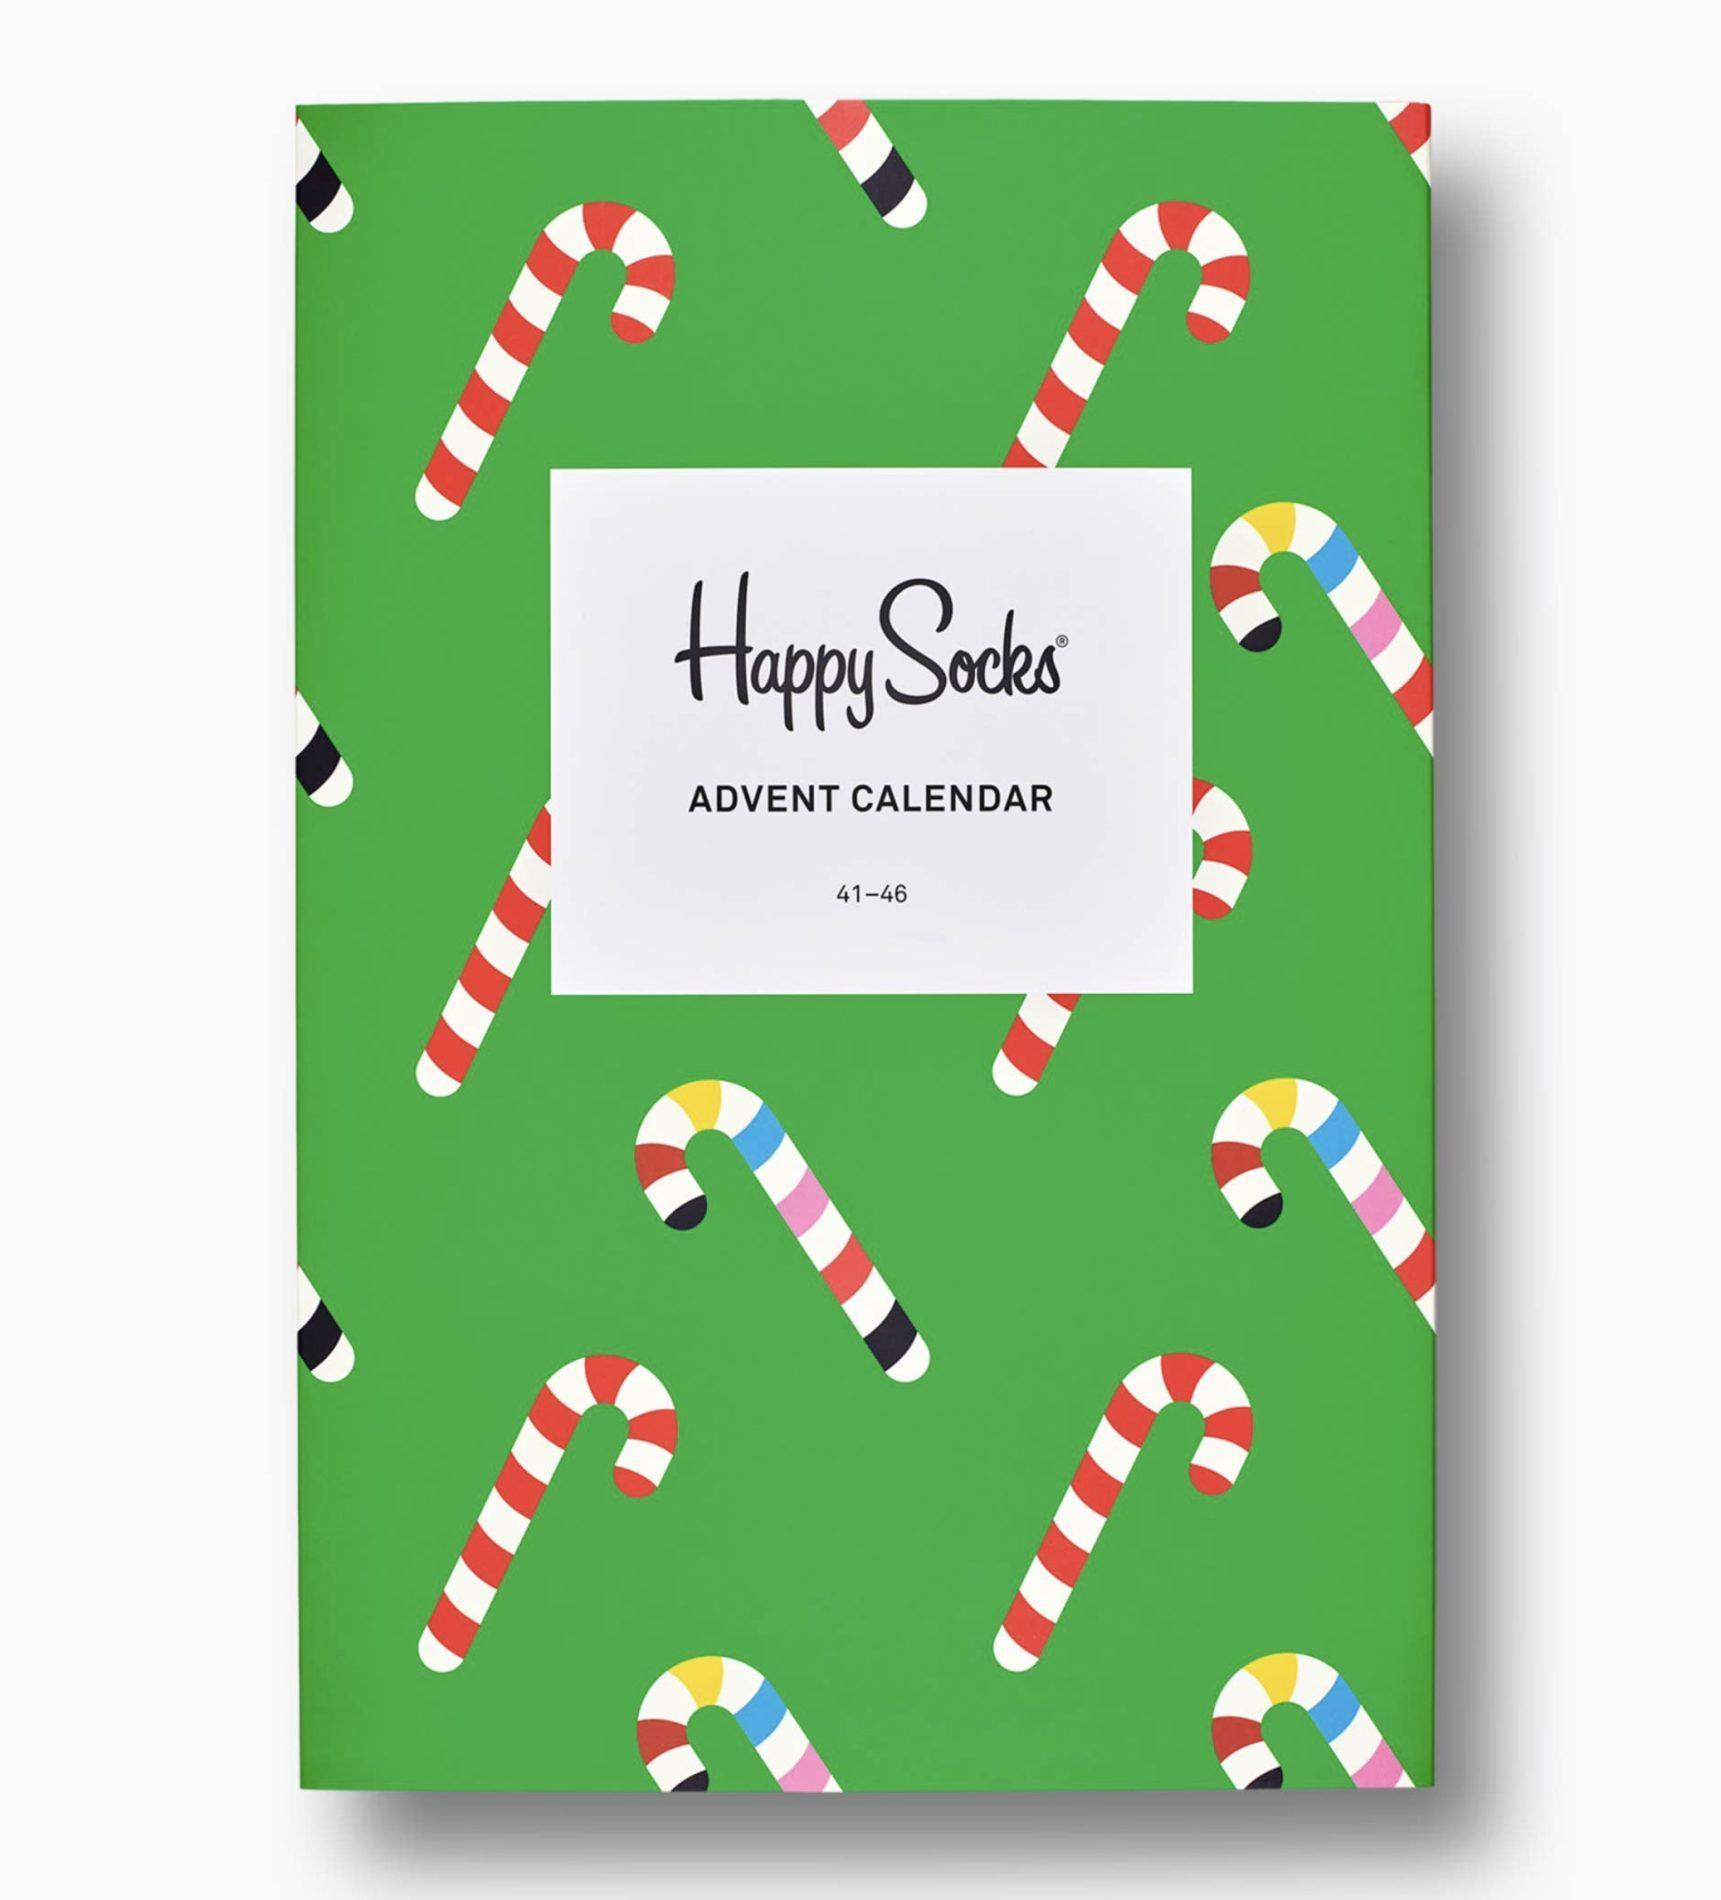 Happy Socks 24 Days of Holiday Socks Advent Calendar – On Sale Now